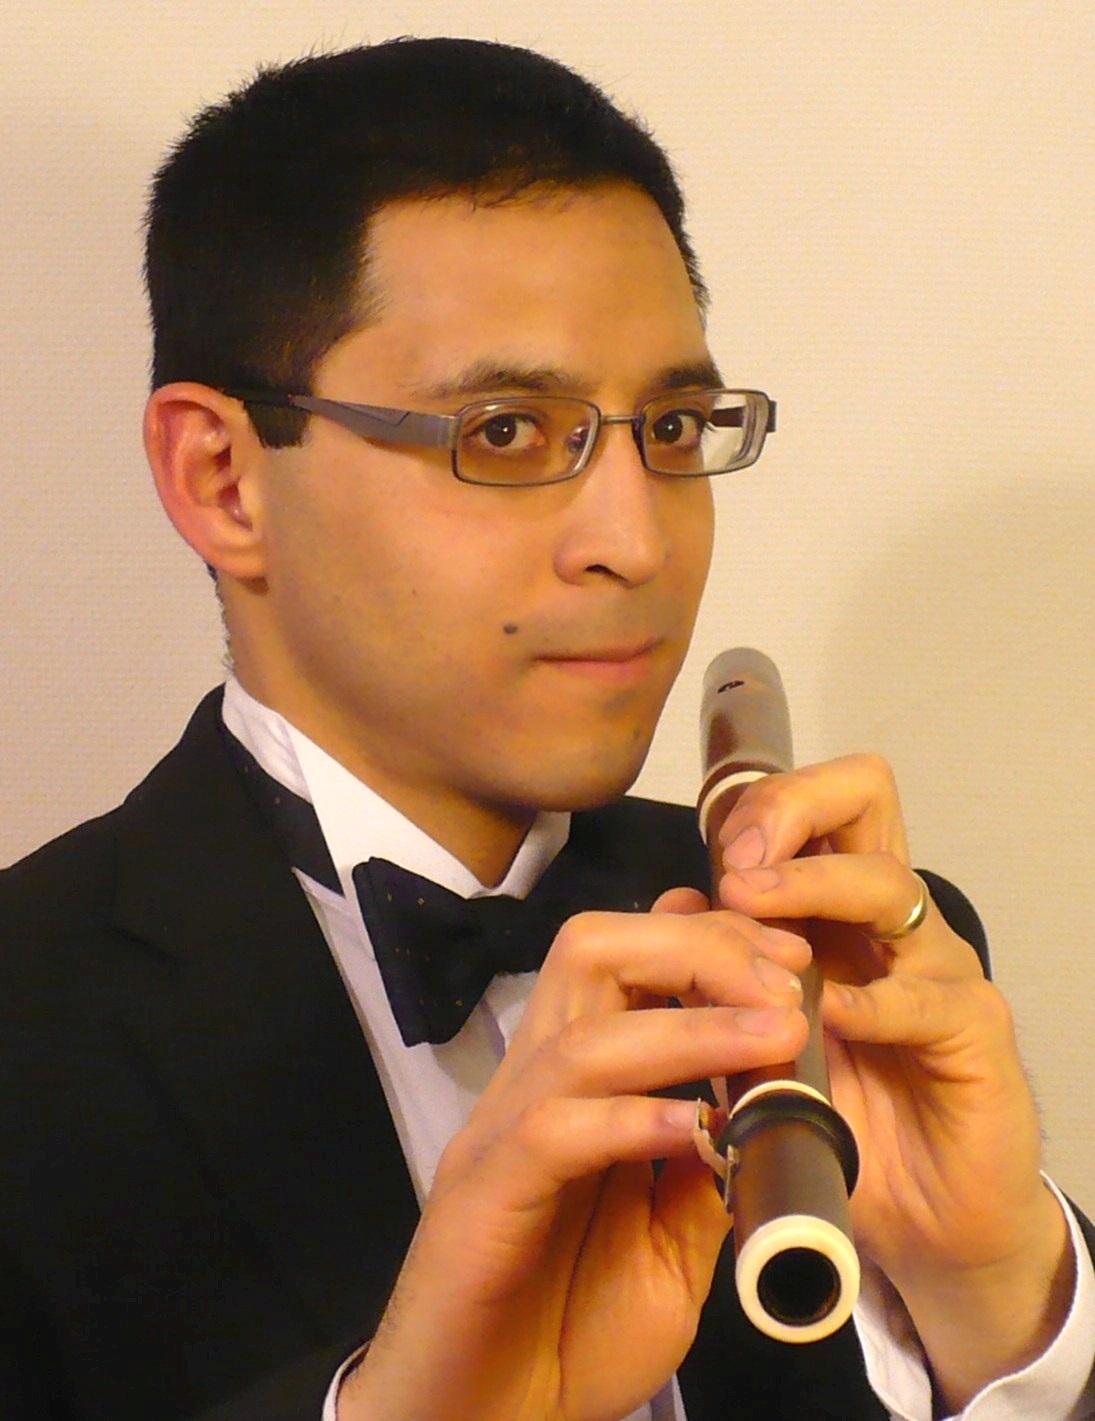 Roberto Bando